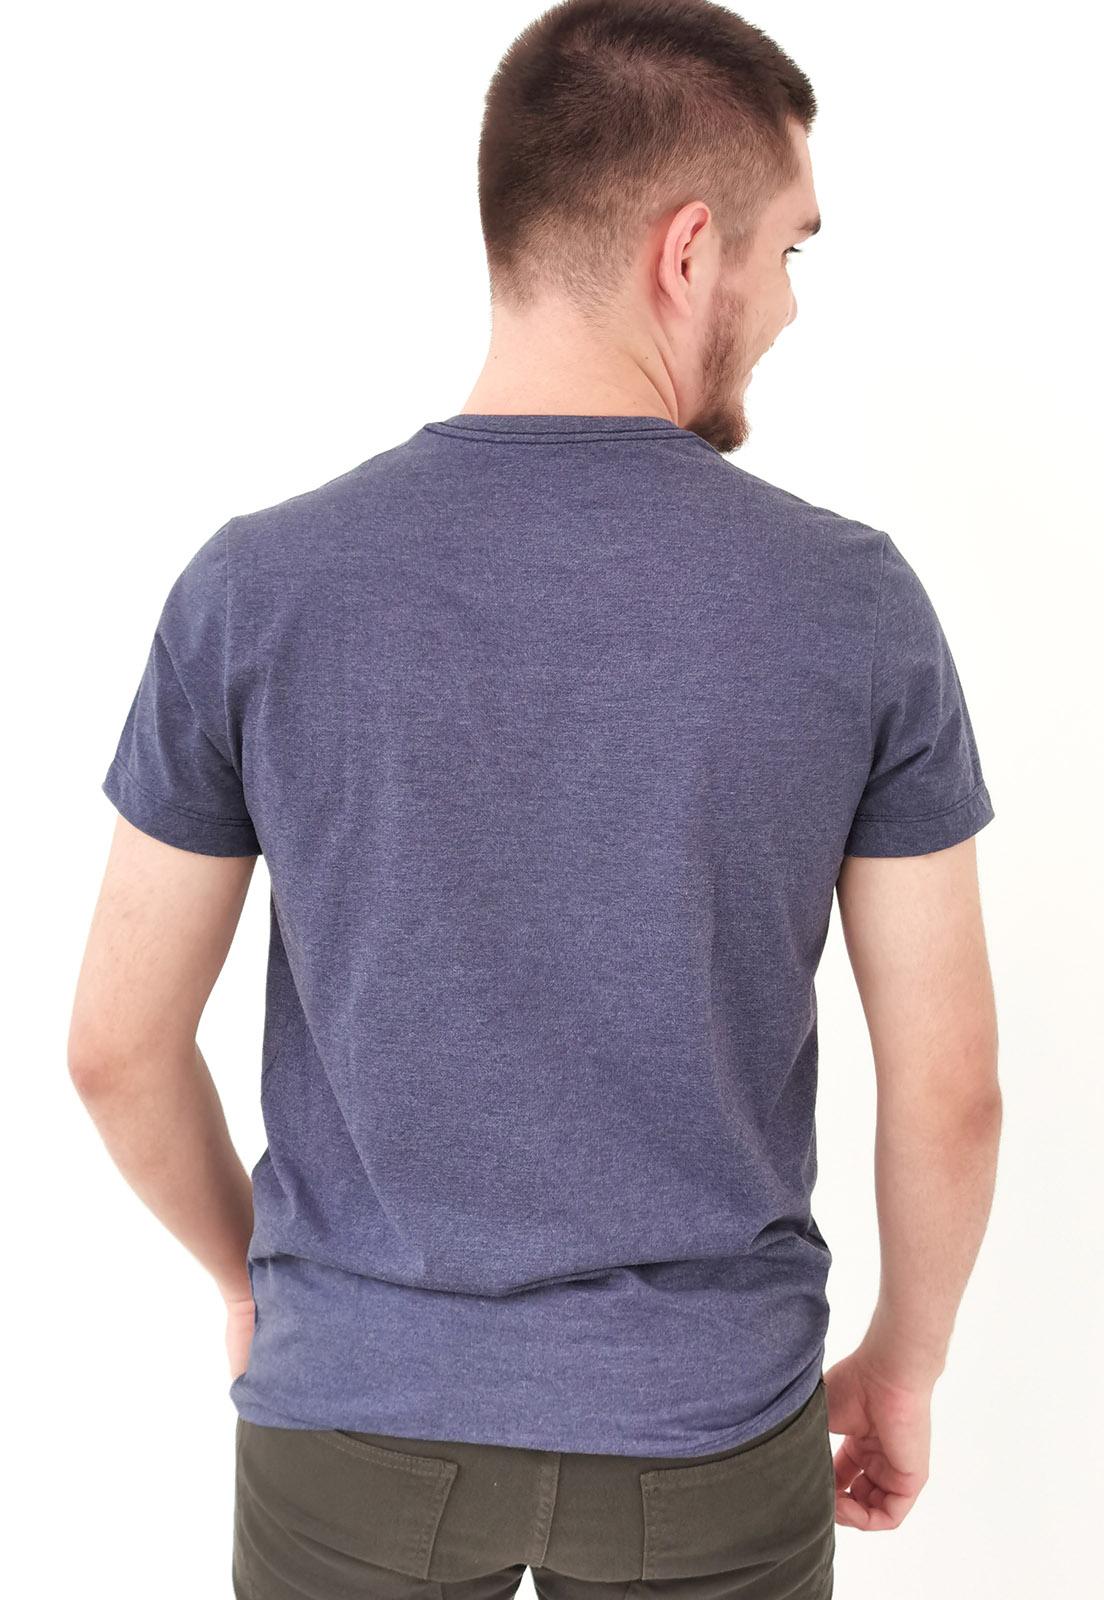 Camiseta Aéropostale Mescla Marinho Básica Plus Size